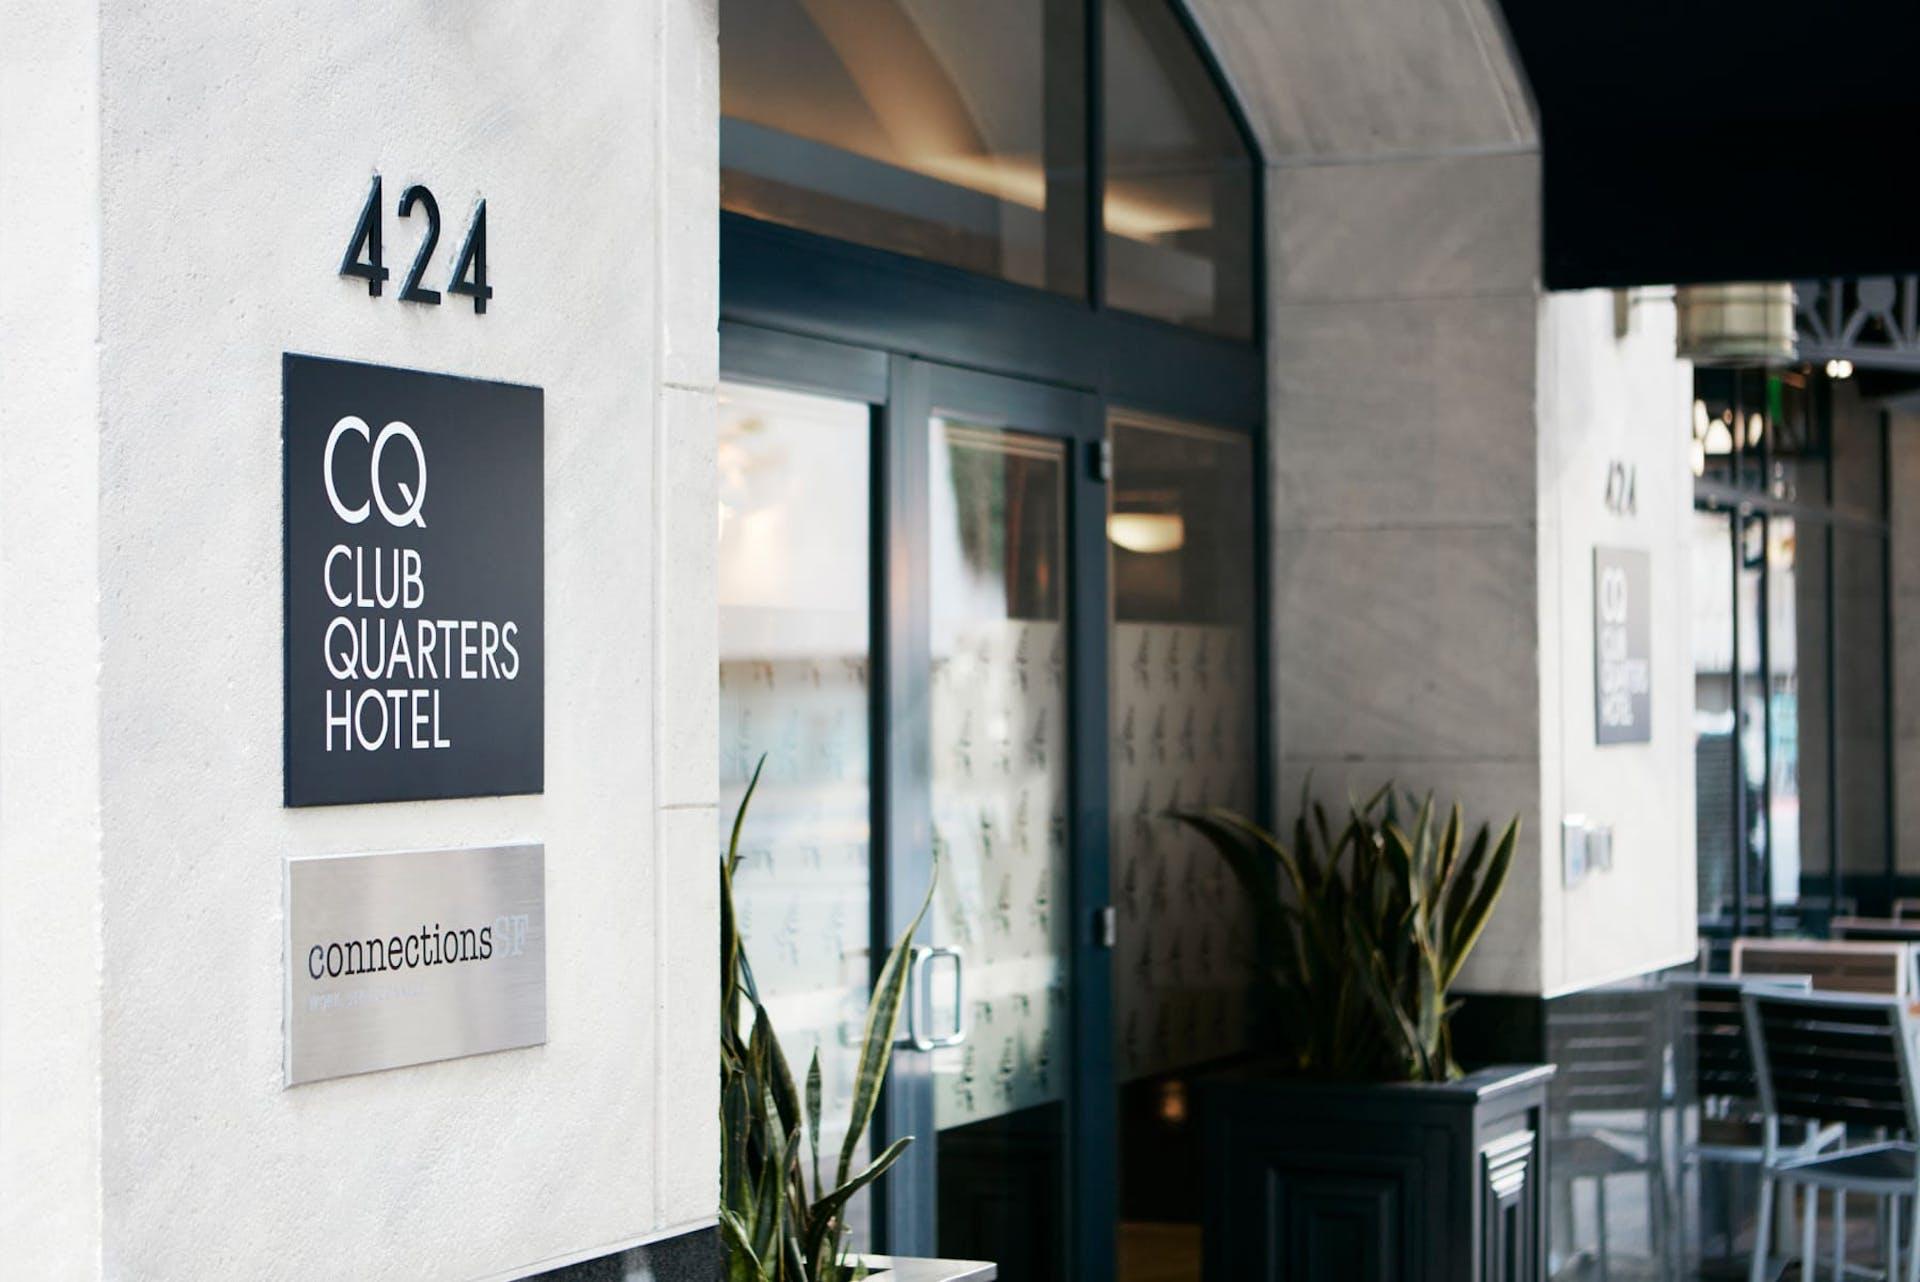 Exterior of CQ Hotel, San Francisco